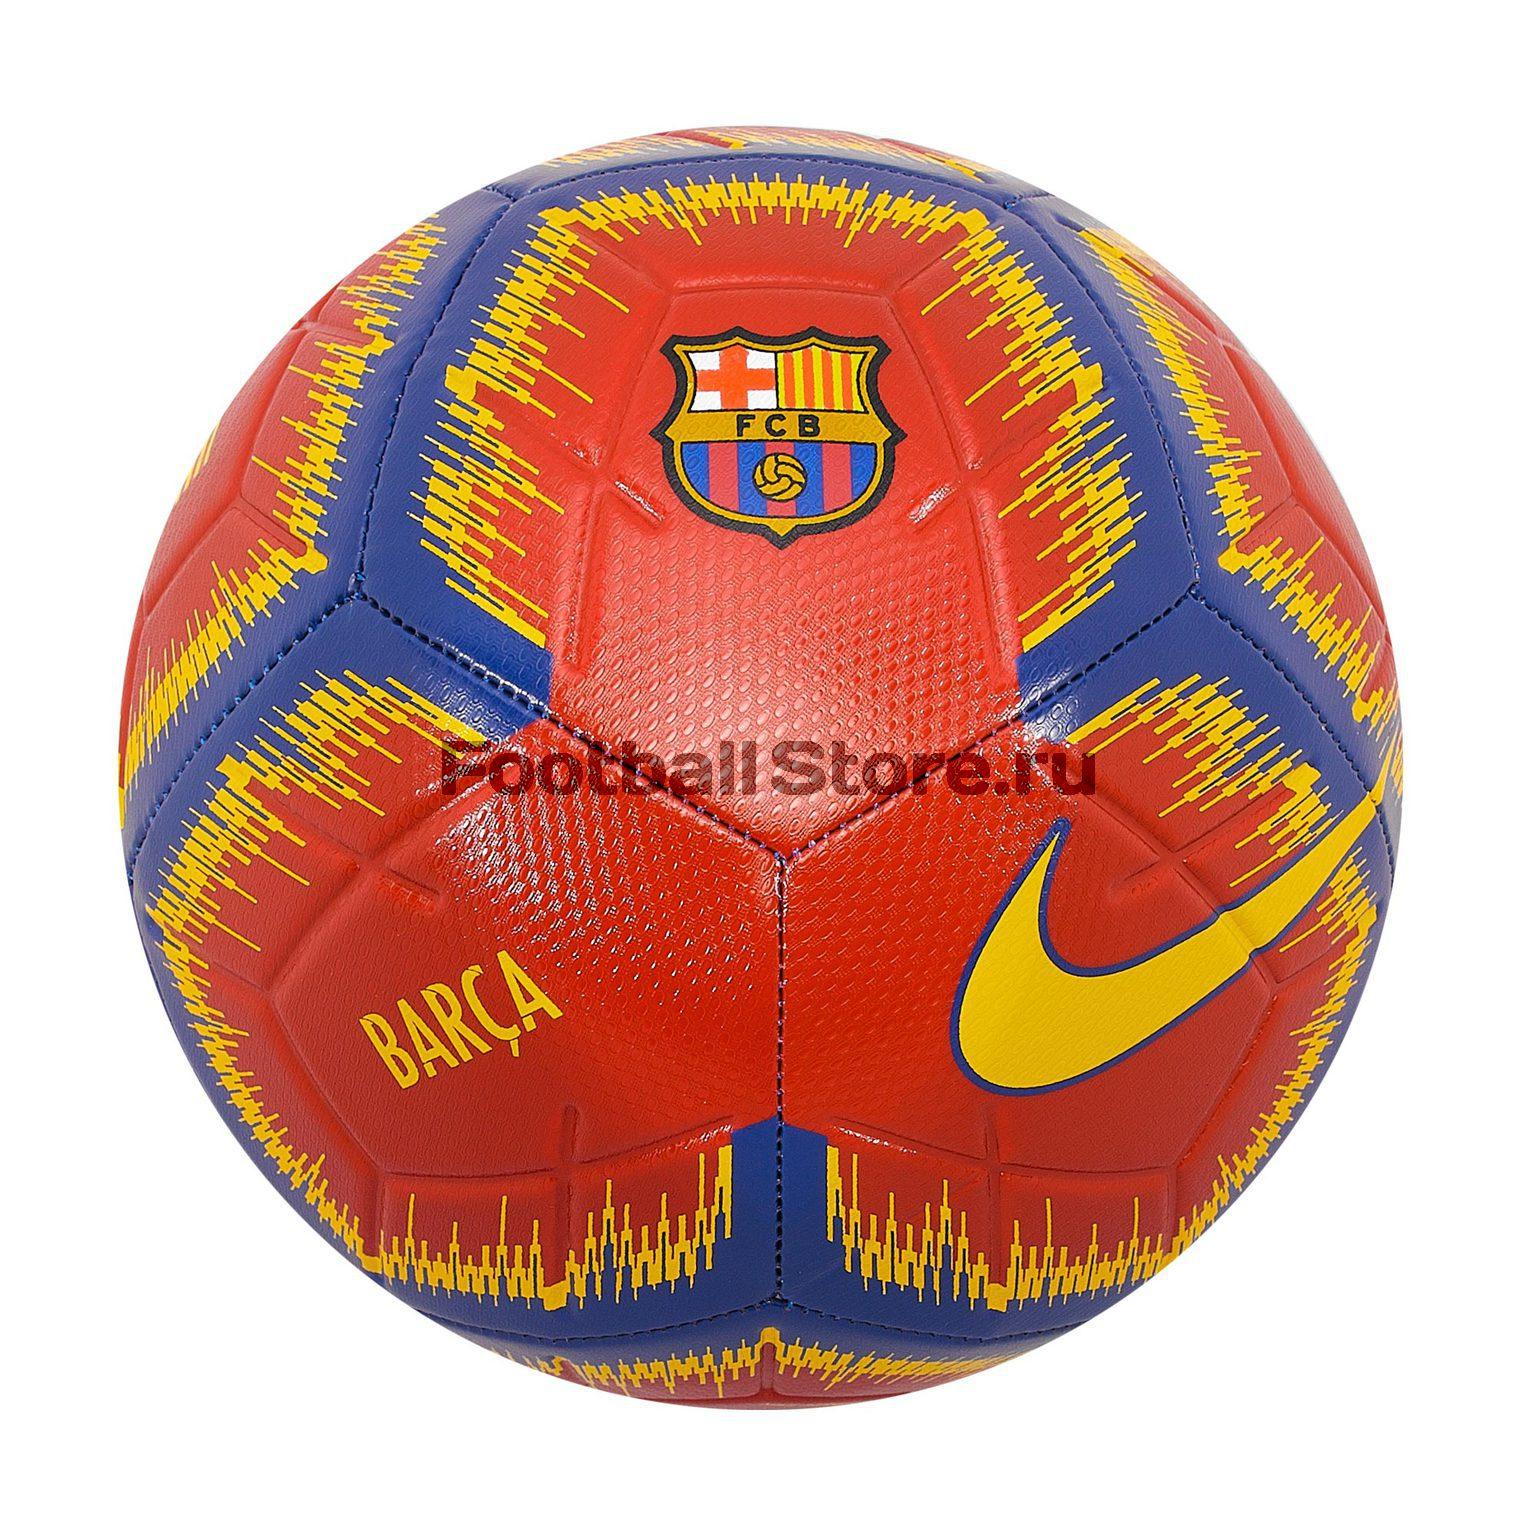 Футбольный мяч Nike Barcelona Strike SC3365-610 цены